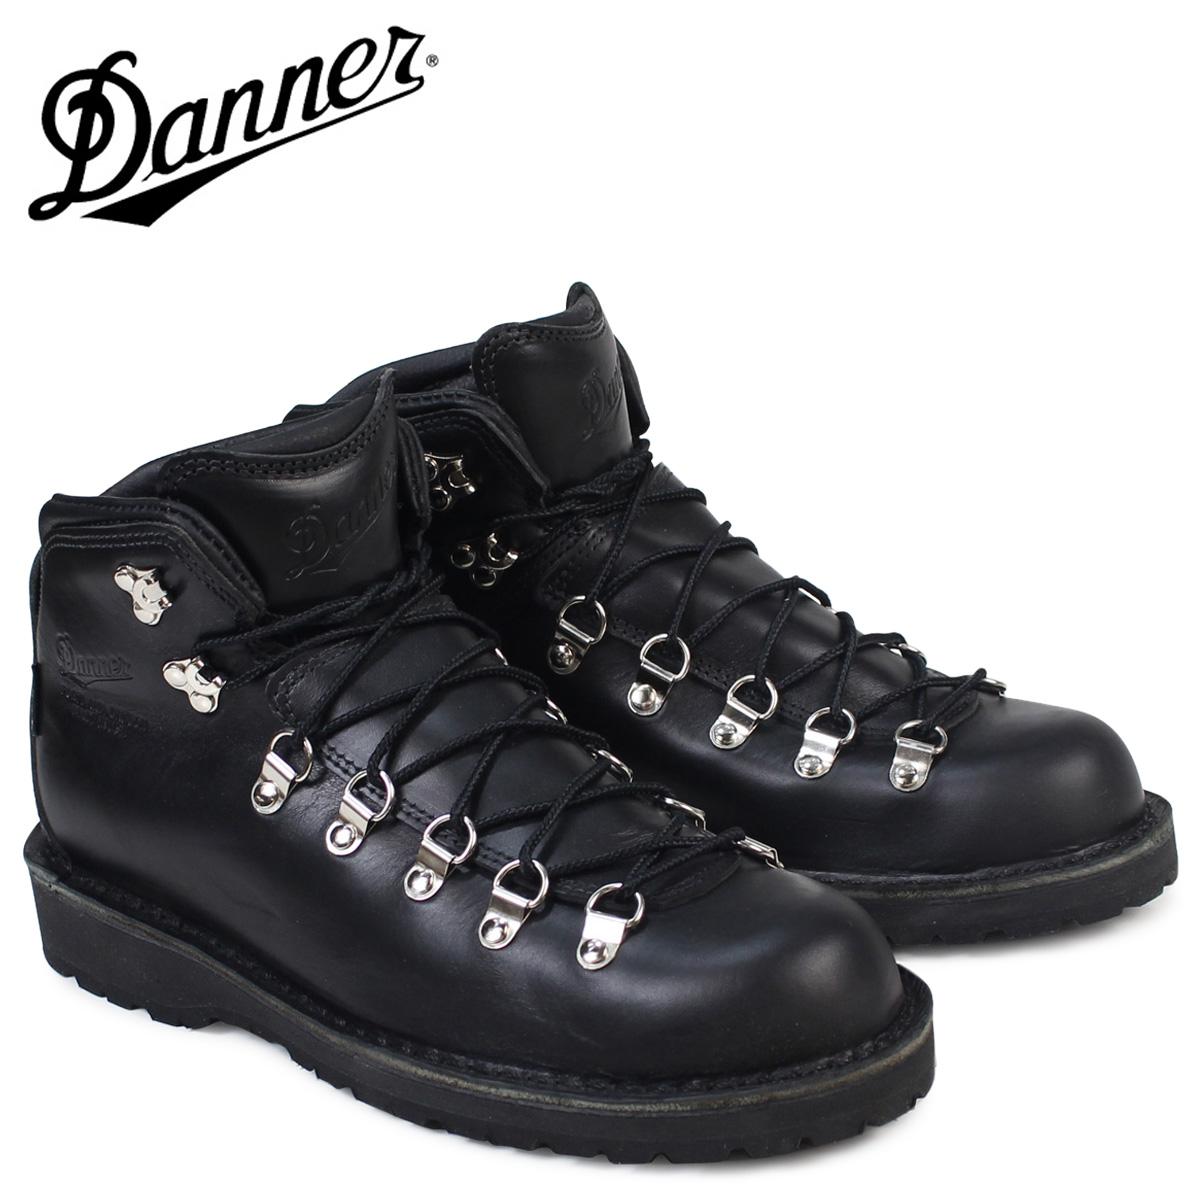 Danner ブーツ ダナー MOUNTAIN PASS 33275 MADE IN USA メンズ ブラック 黒